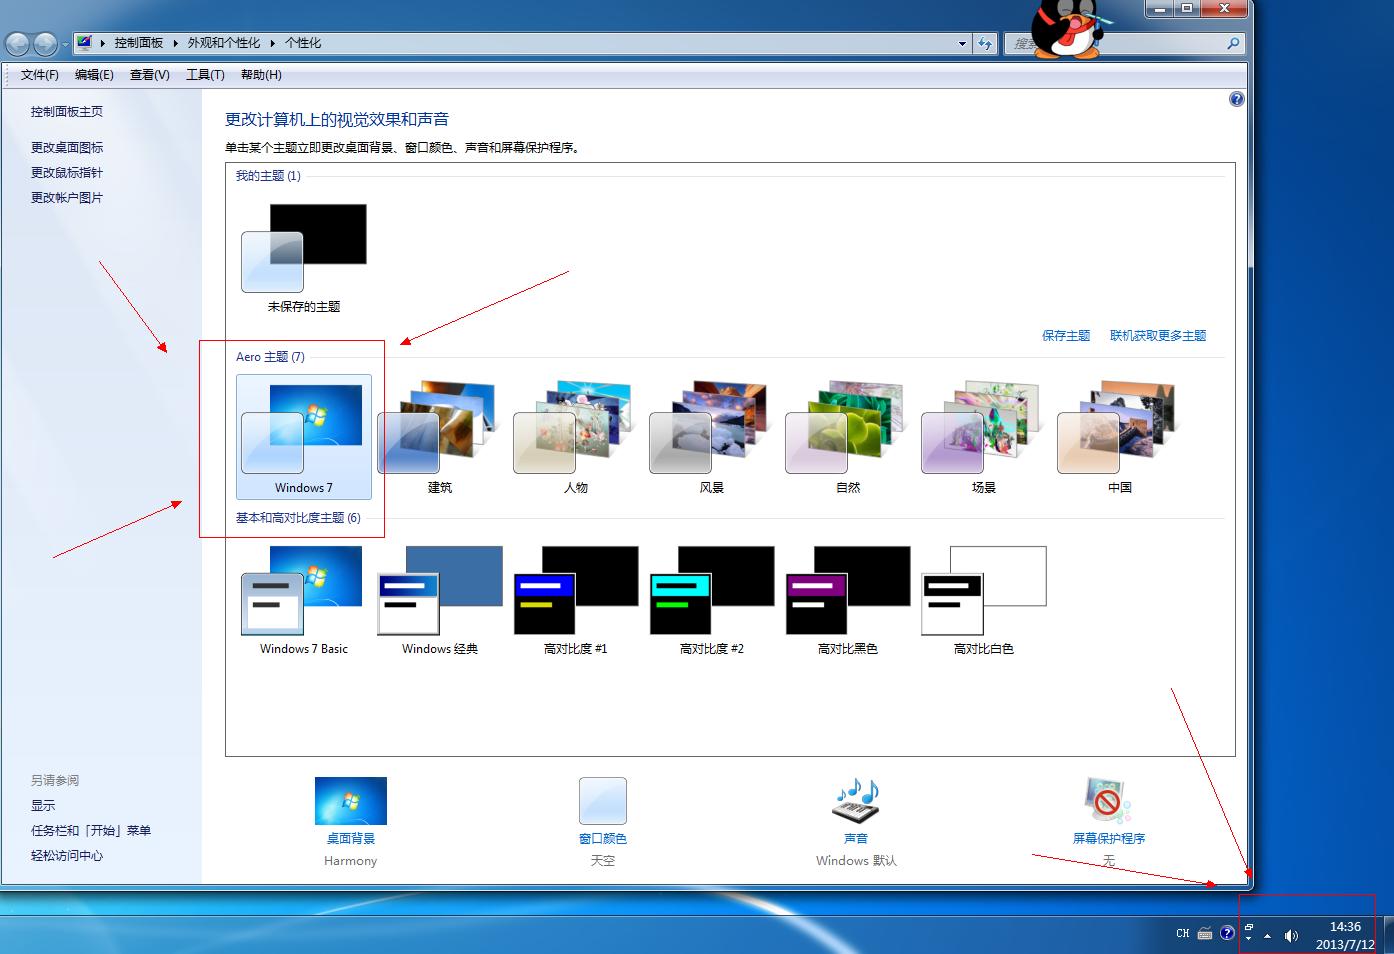 win7旗舰版桌面壁纸一直在变,变化的是未保存的主题,怎么取消?图片